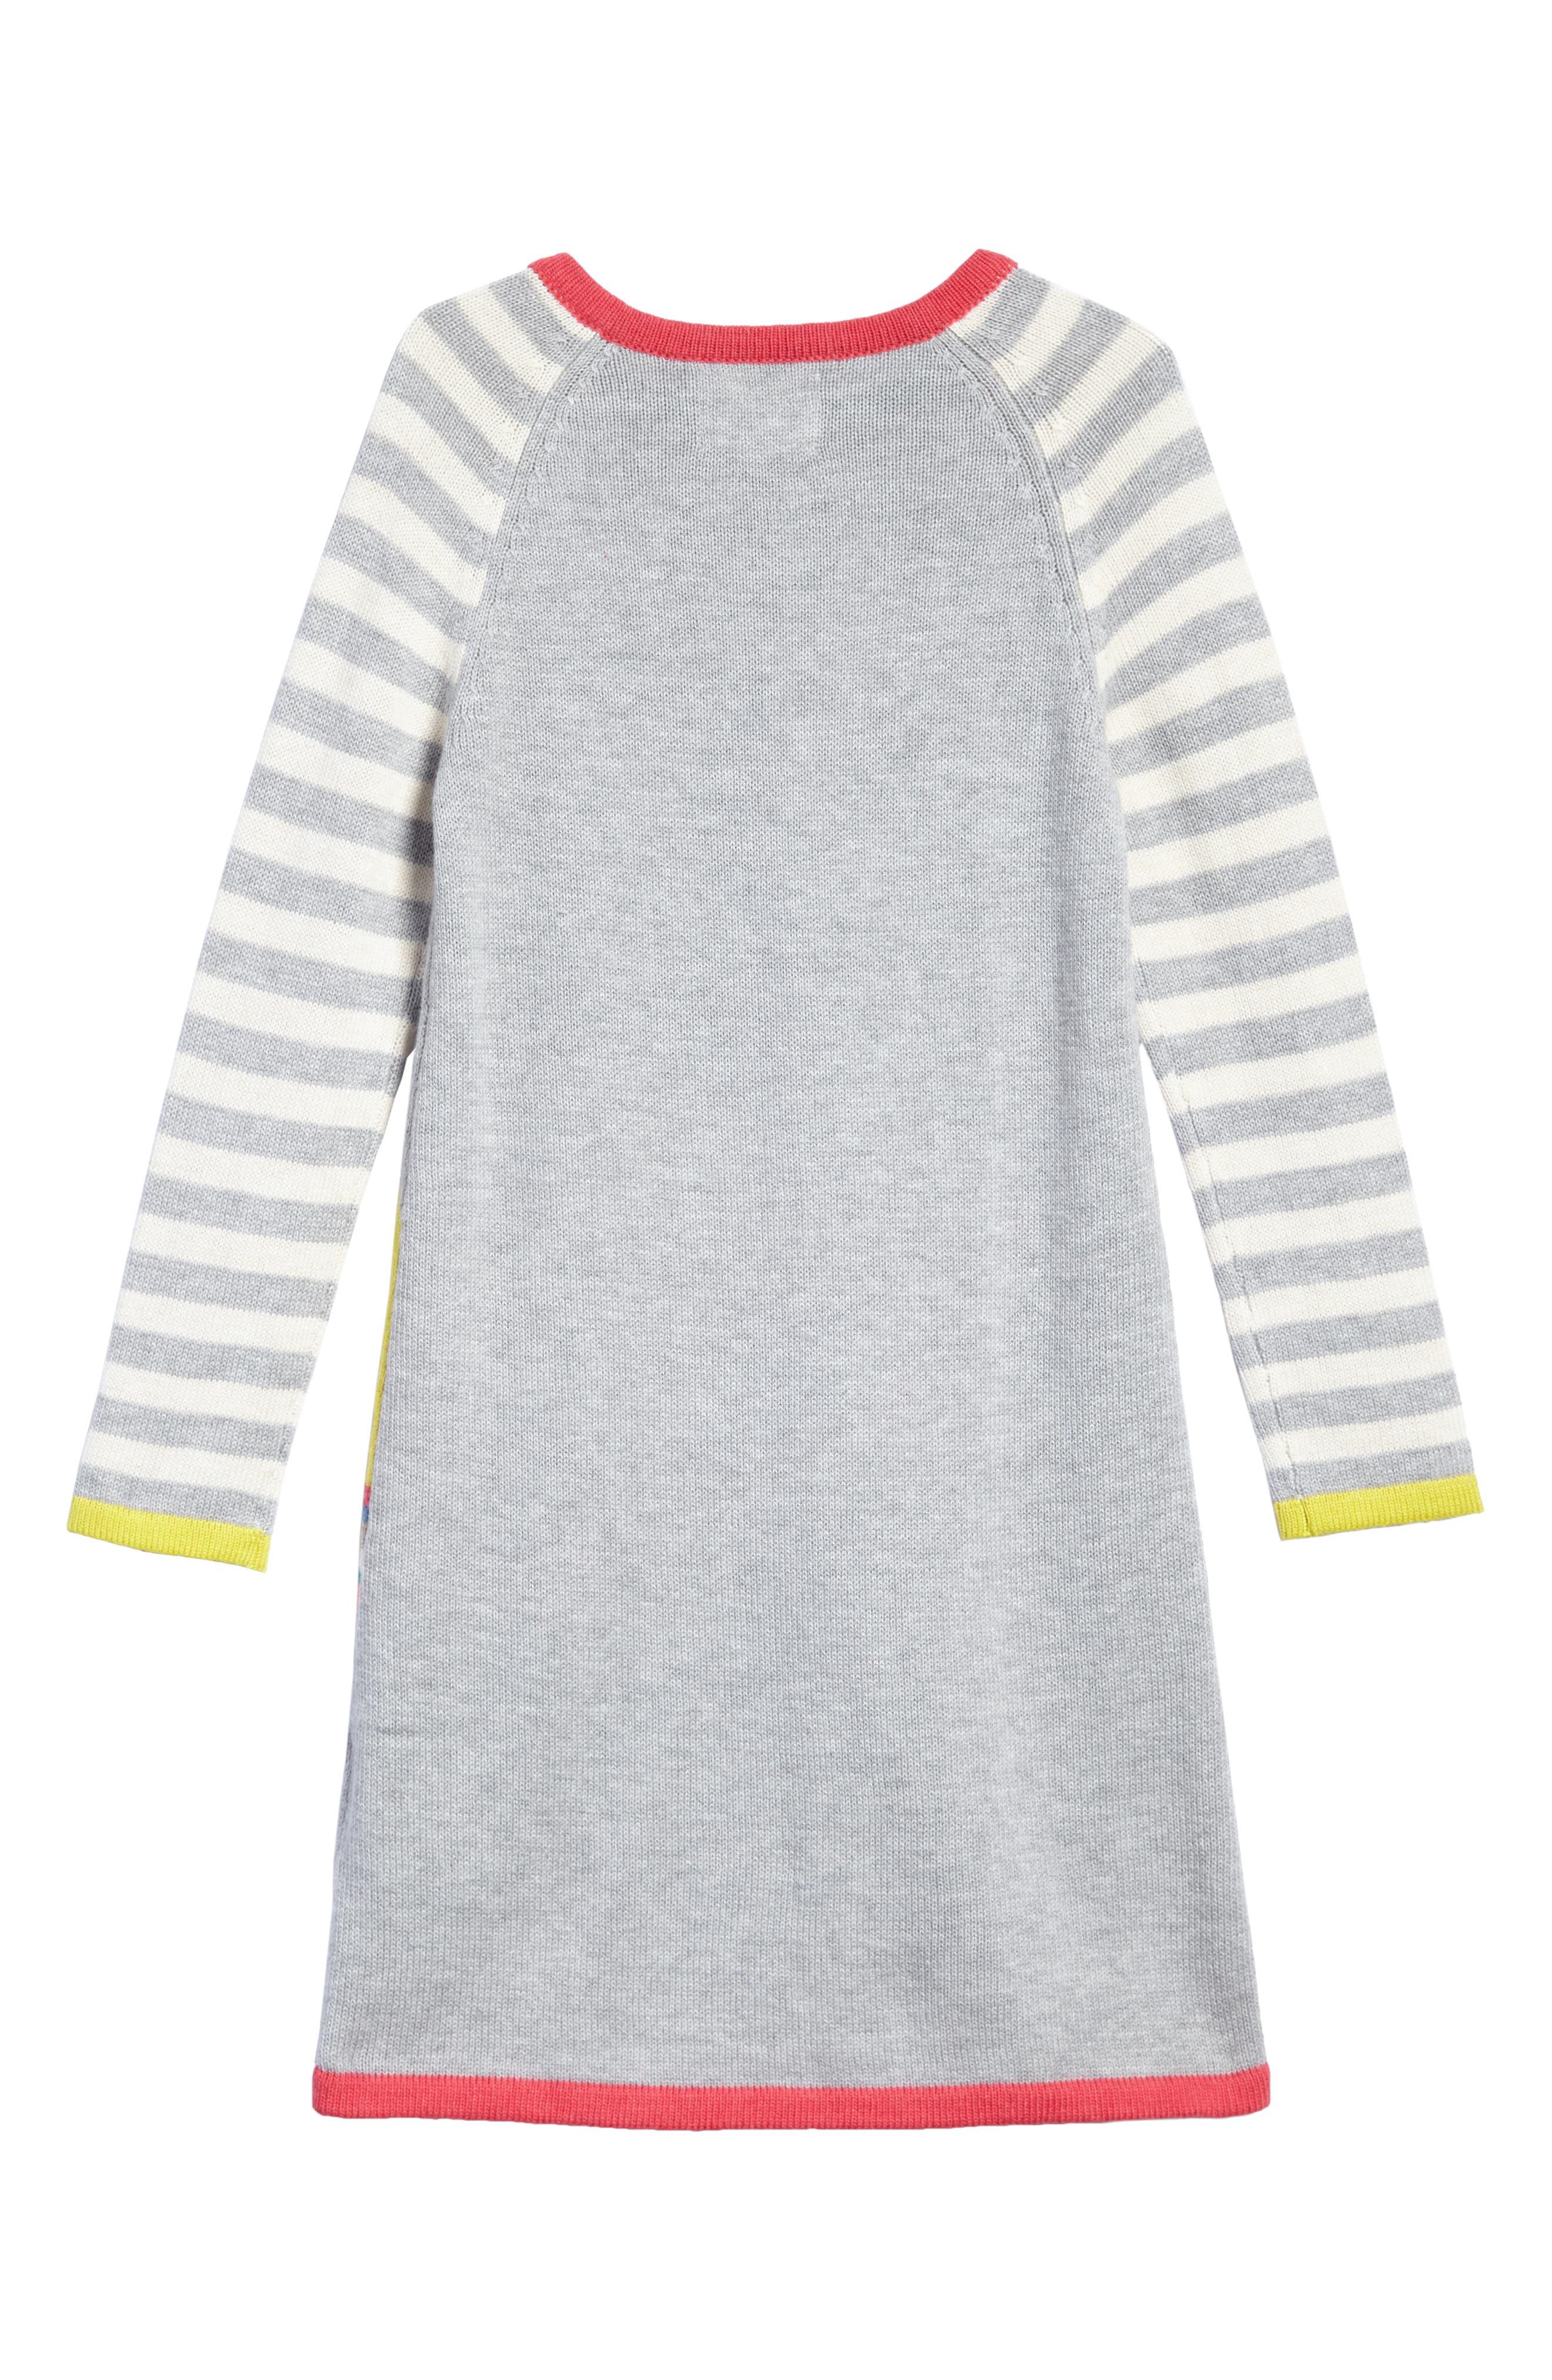 Alternate Image 2  - Mini Boden Fun Knit Dress (Toddler Girls, Little Girls & Big Girls)